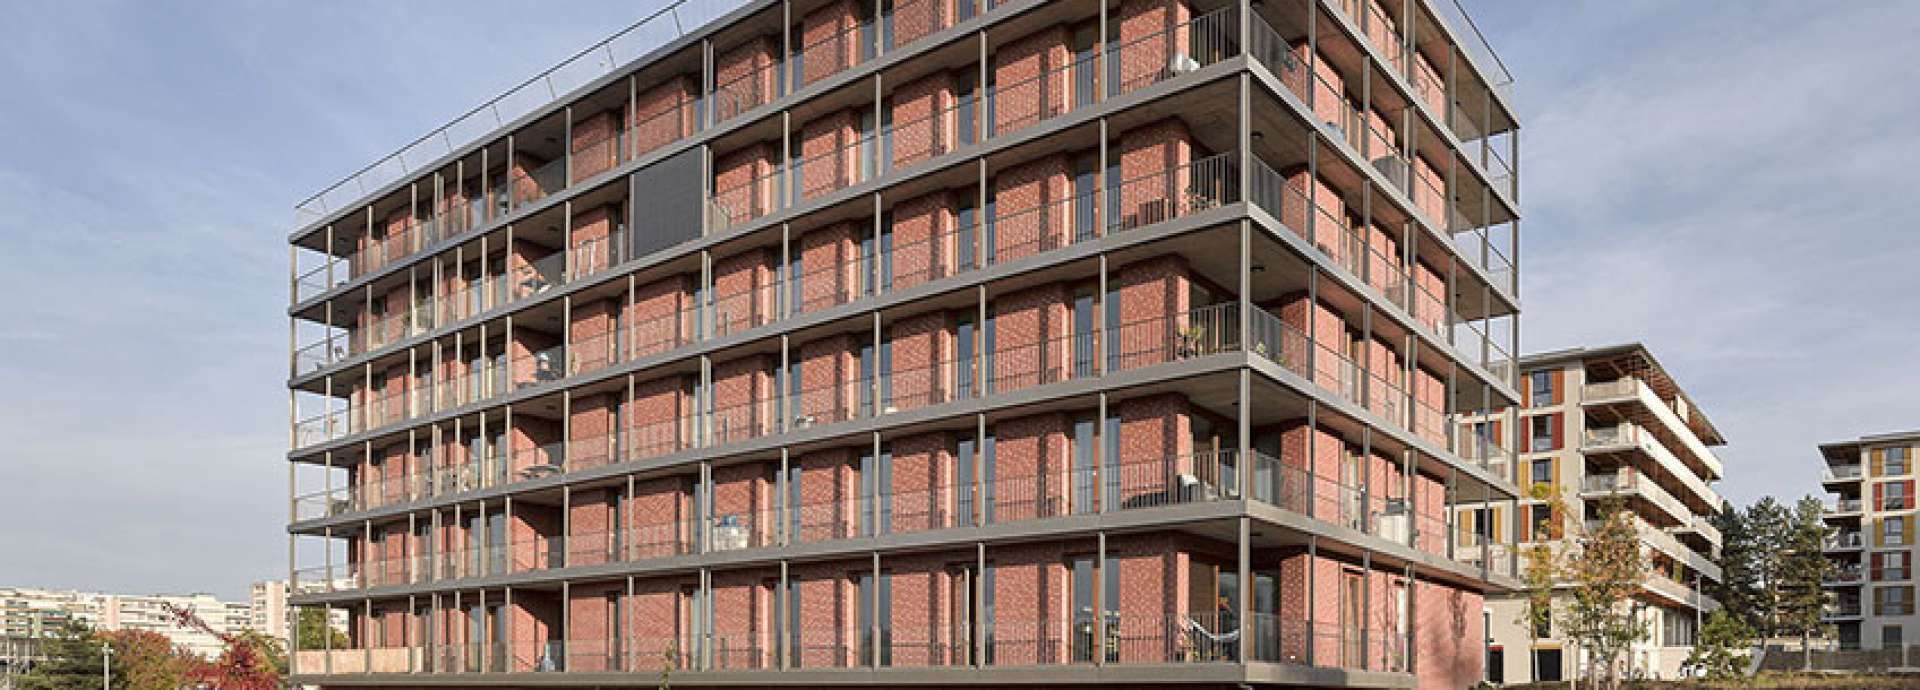 Ecoquartier_résidence-écologique_meyrin_vergers-1